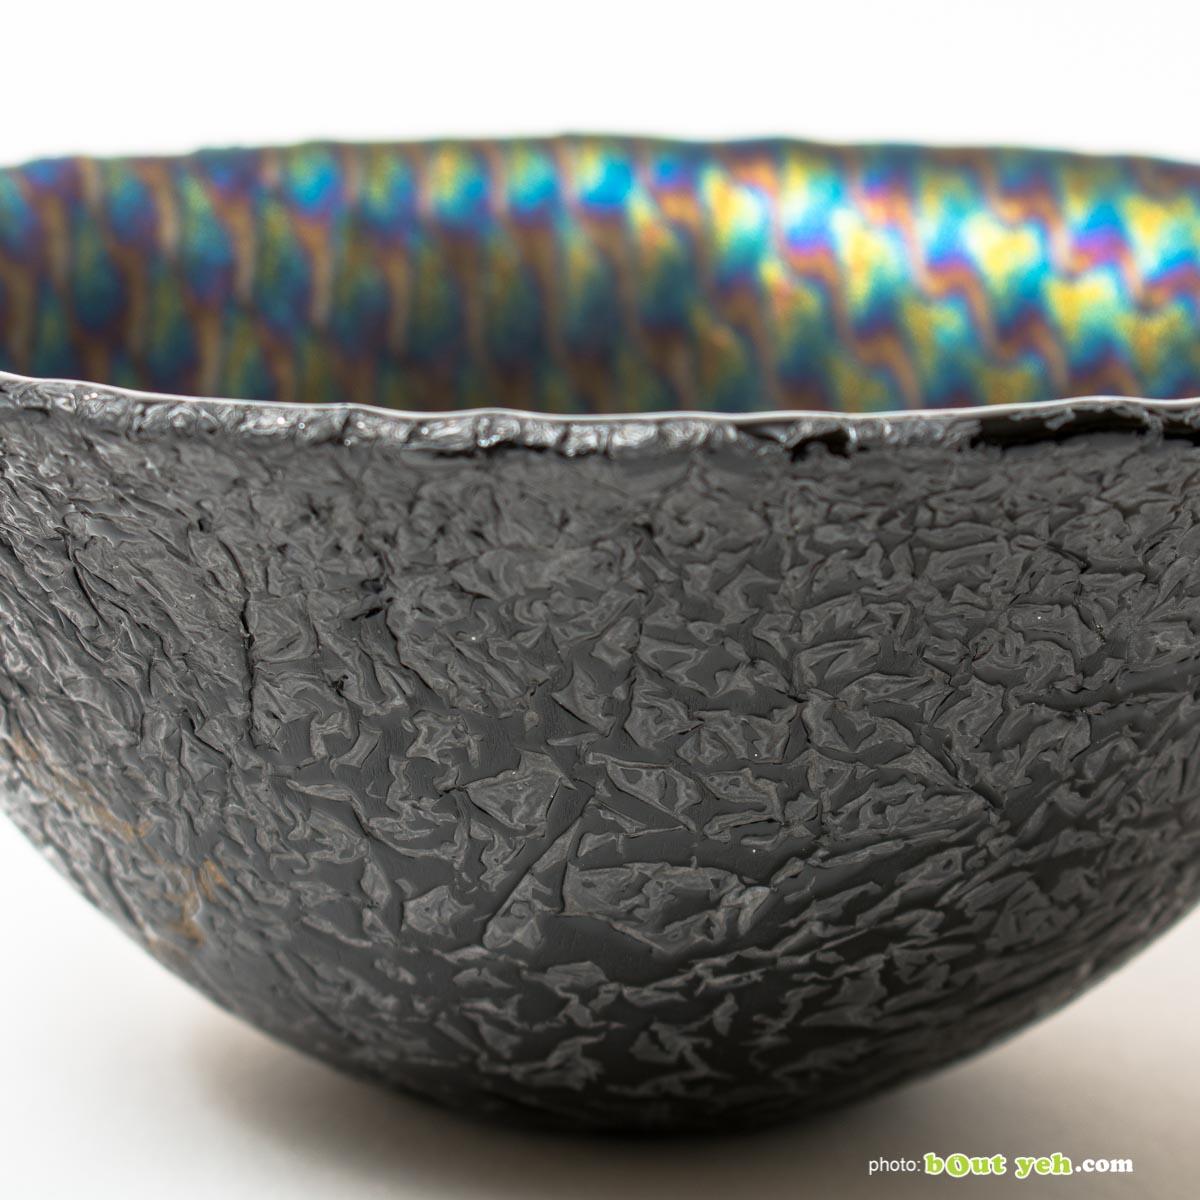 Iridised peacock pattern black glass bowl, hand made by Keith Sheppard Irish glassware - photo 1549